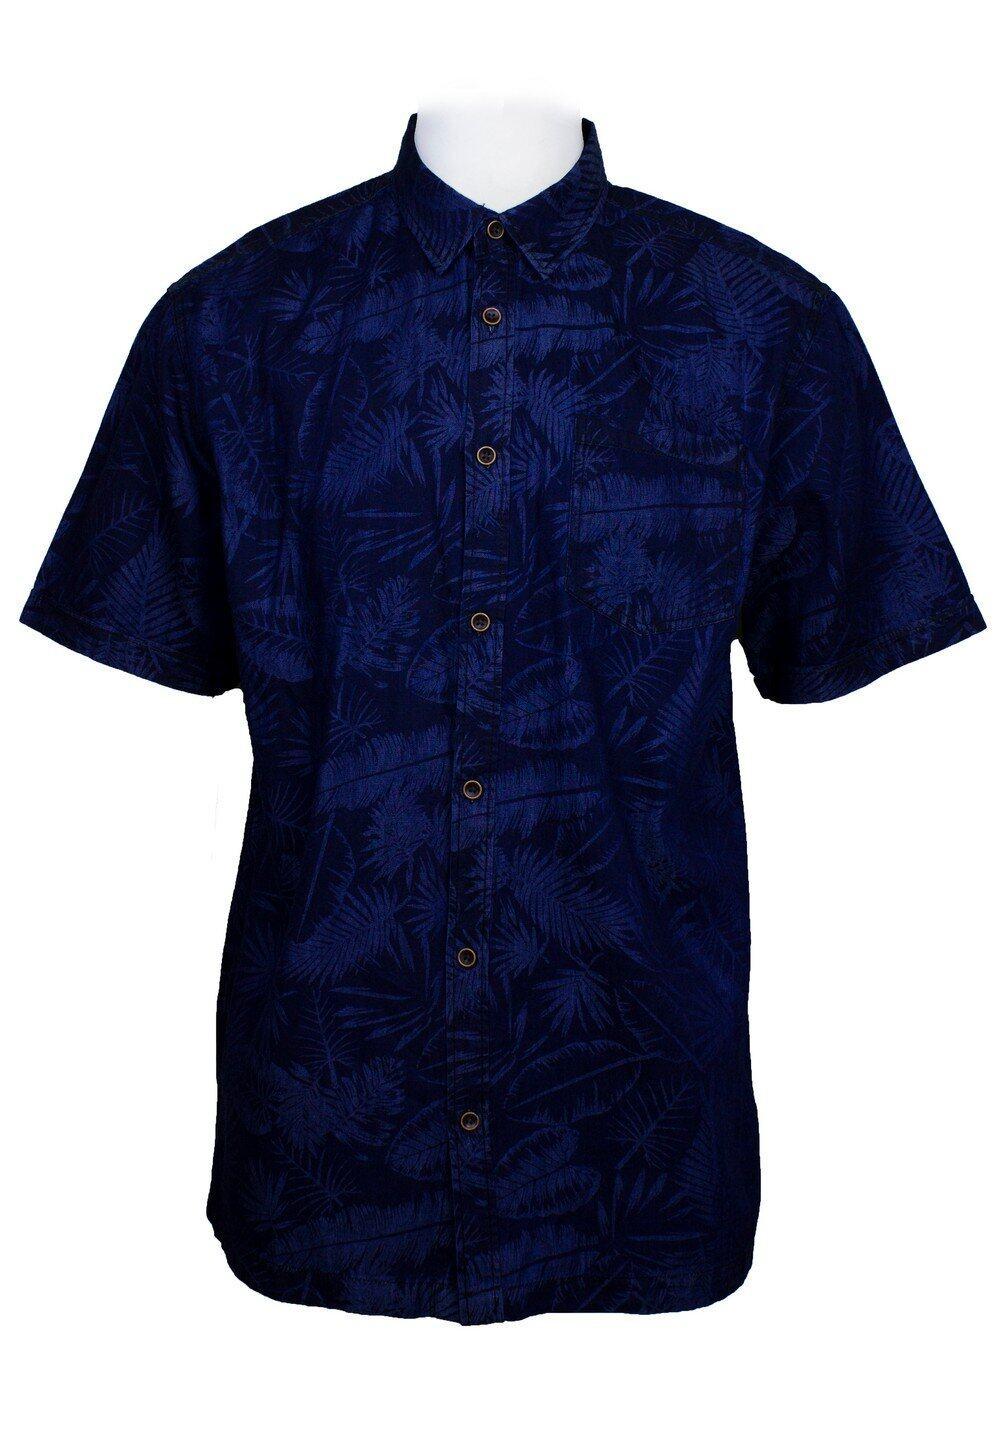 Short Sleeve Shirt with Flower Print (M-2XL)-817